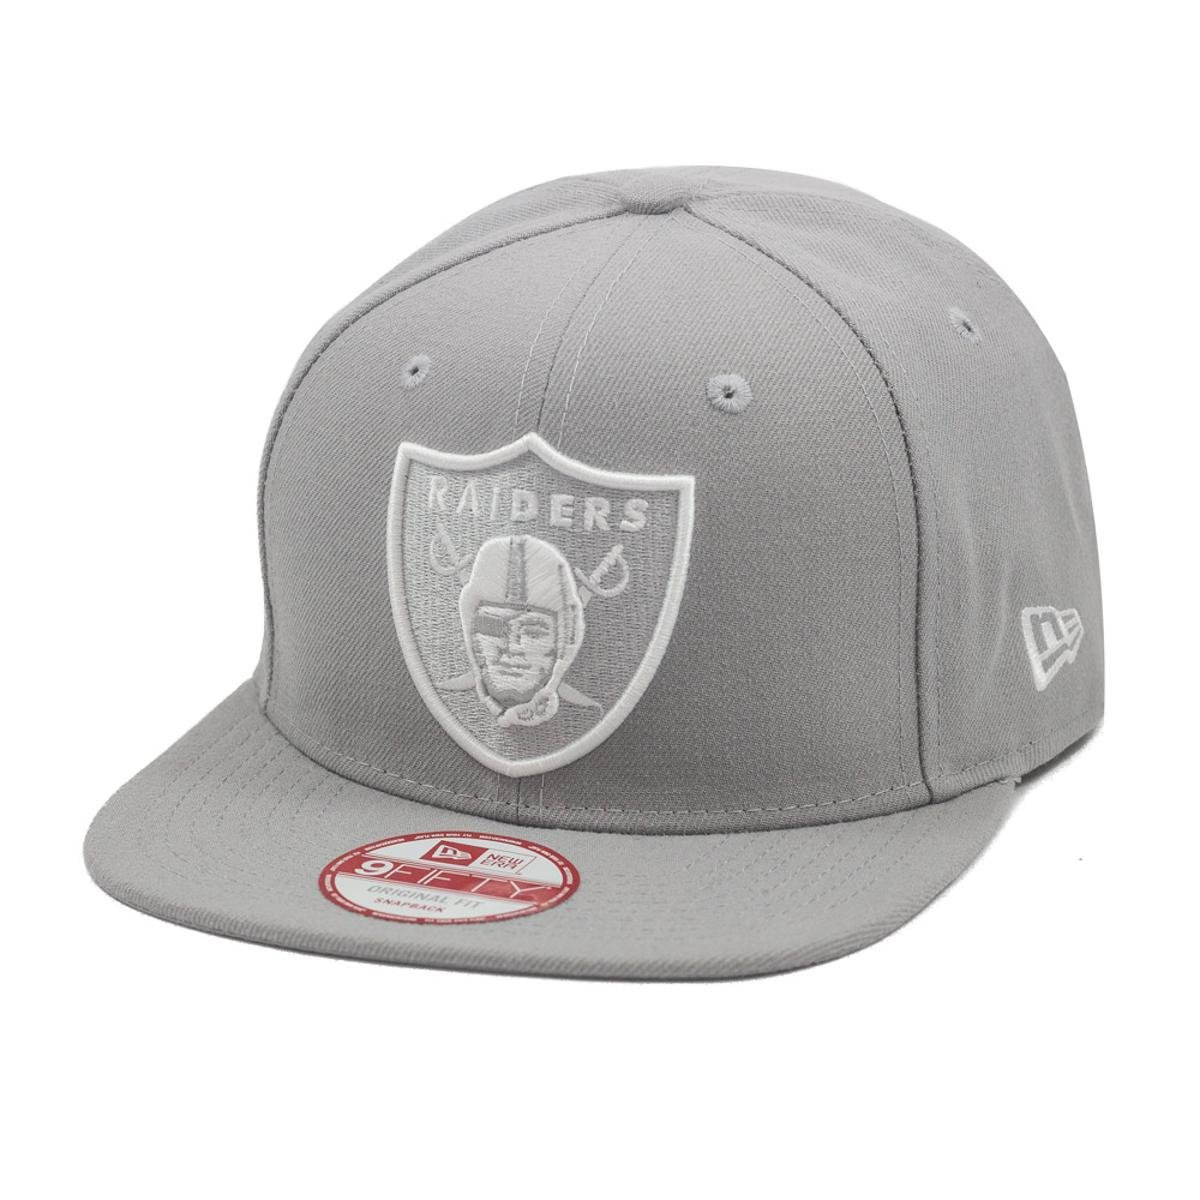 Boné New Era Snapback OF Oakland Raiders NFL - Cinza - Compre Agora ... e1a2eecc698